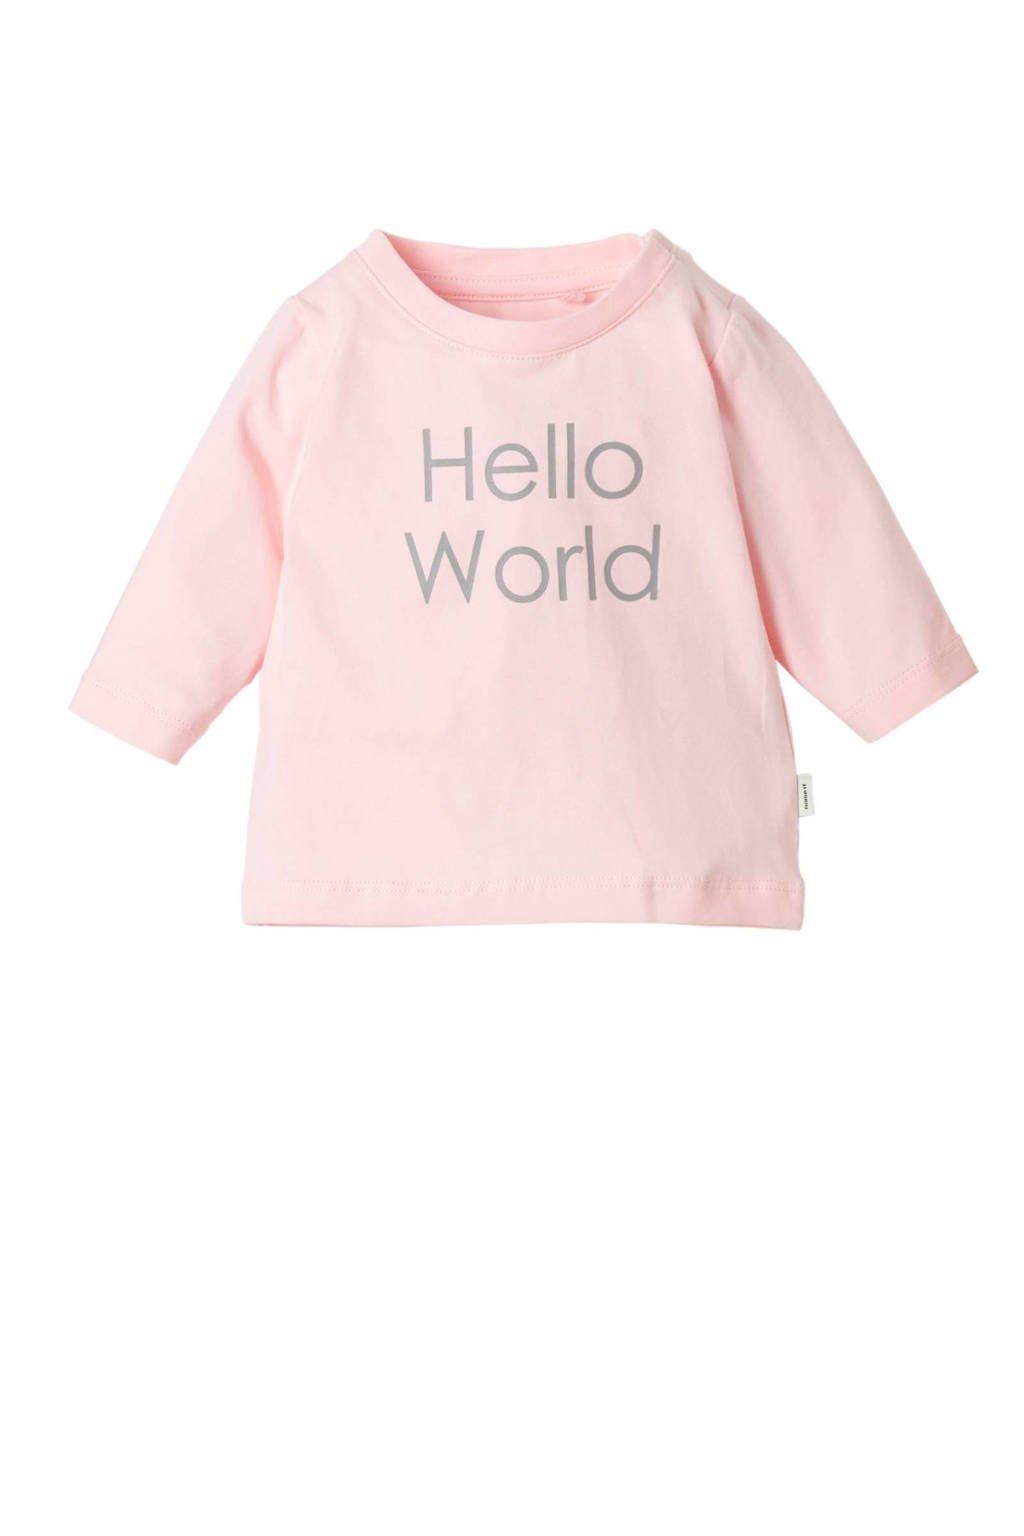 NAME IT BABY longsleeve met tekst roze/grijs, Roze/grijs